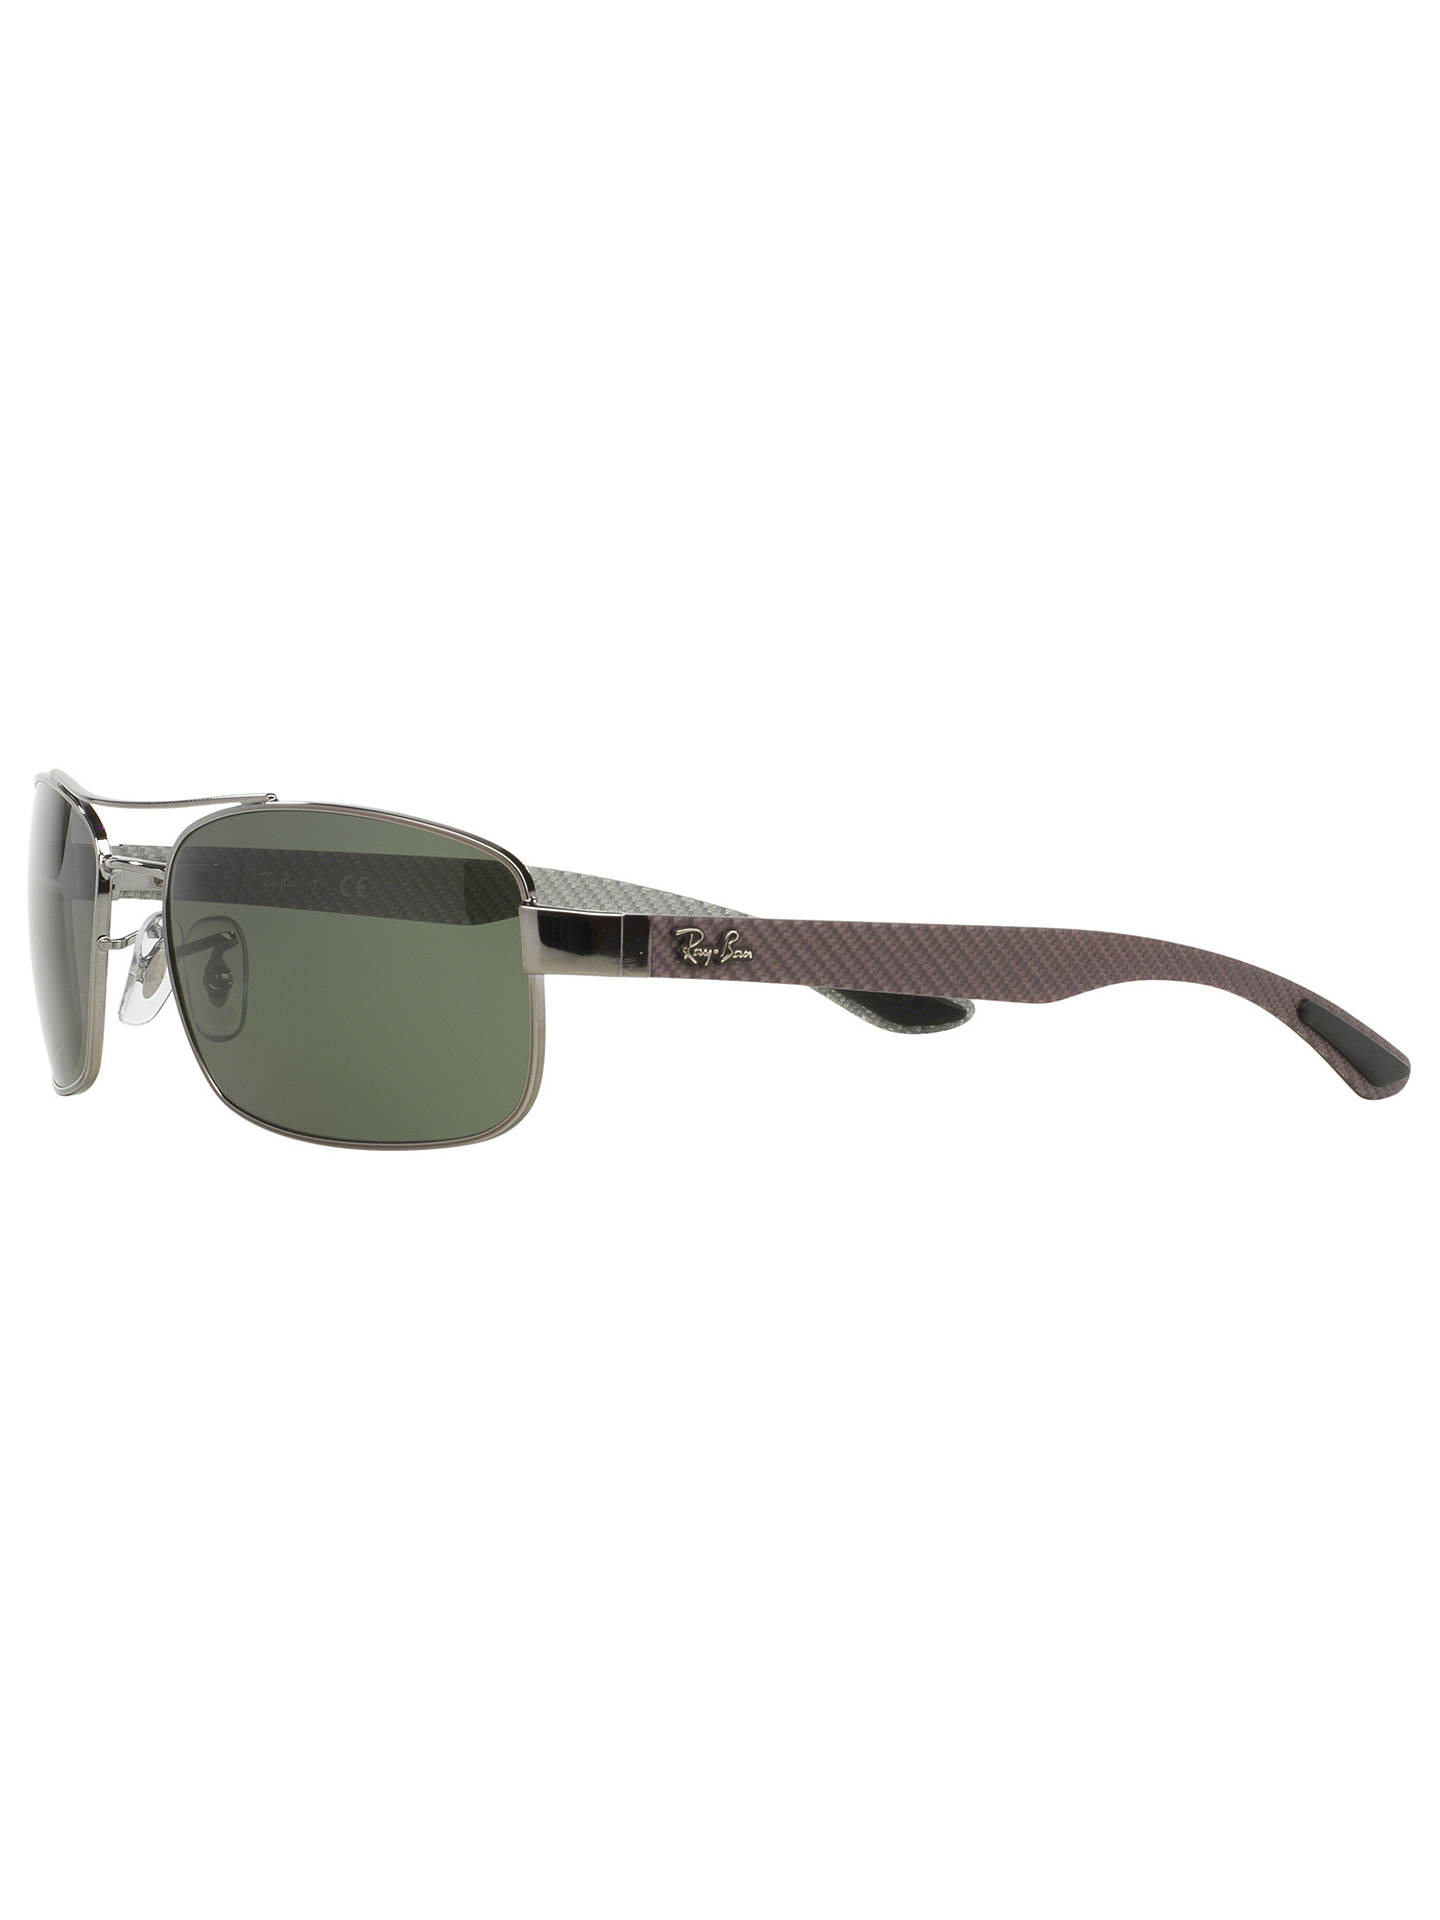 7029a3d5d2 ... BuyRay-Ban RB8316 Tech Carbon Fibre Rectangular Sunglasses